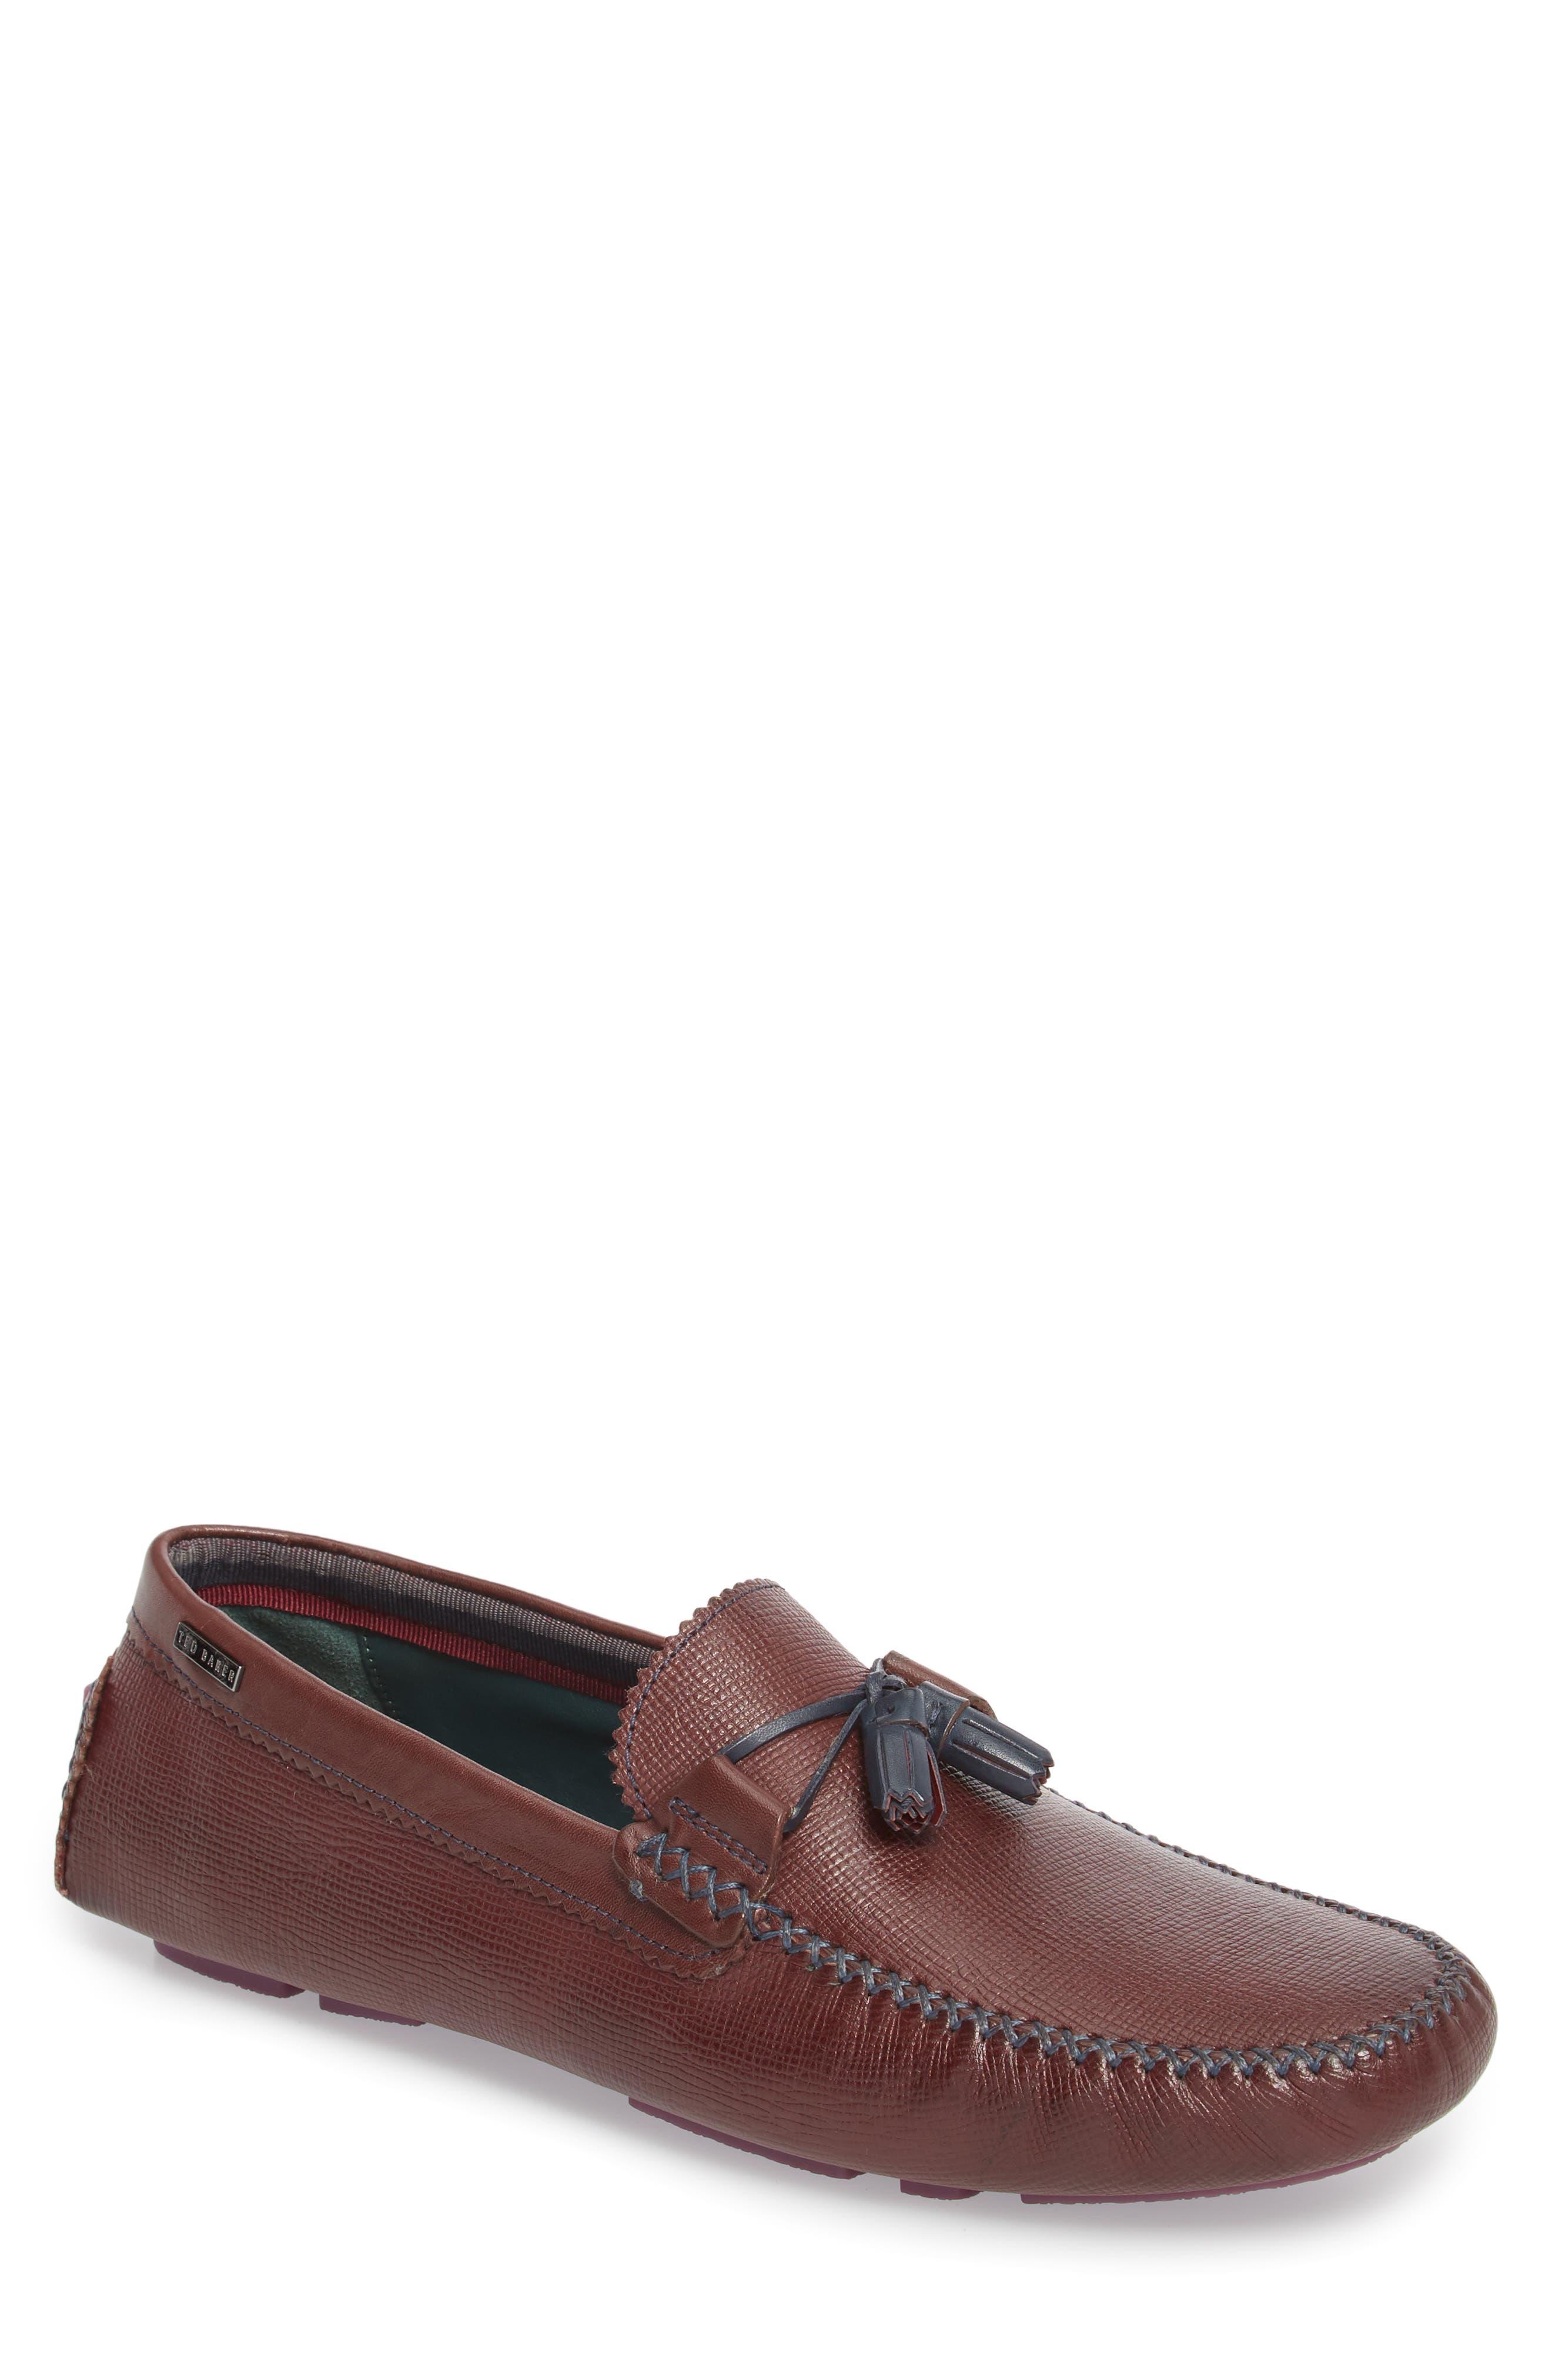 Urbonn Tasseled Driving Loafer,                         Main,                         color, Dark Red Leather